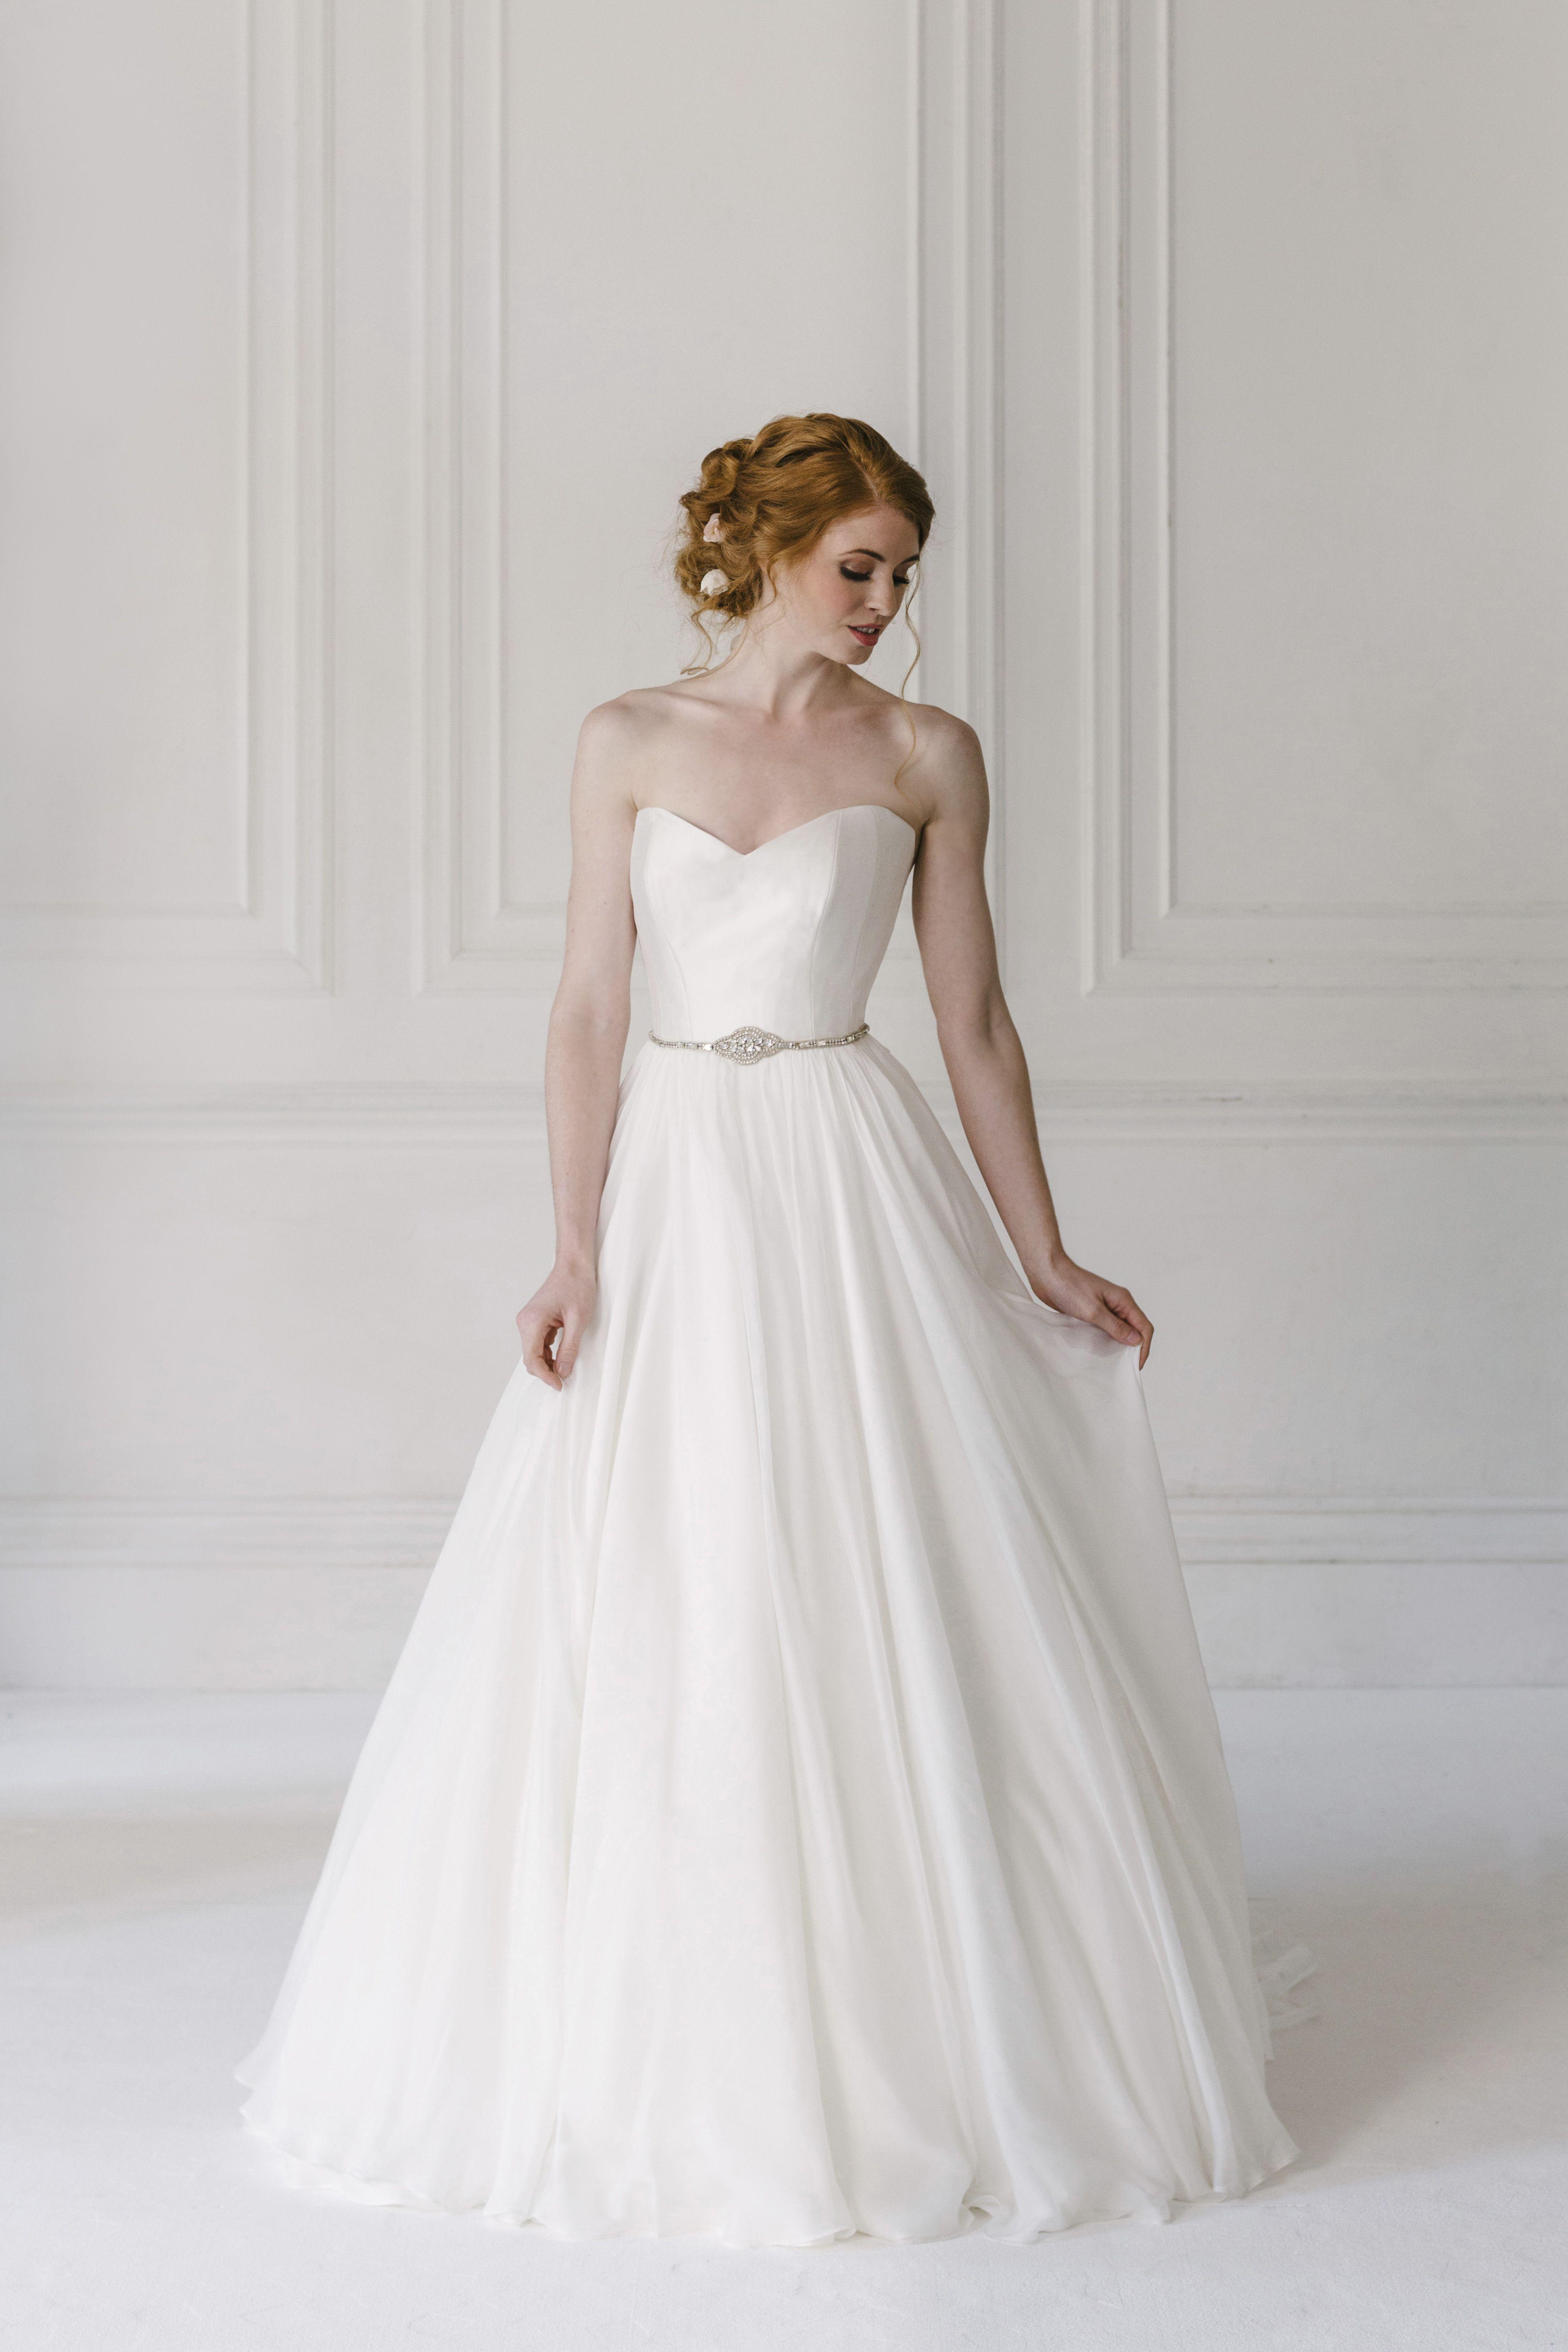 Naomi Neoh \'Ivory Fleur\' - A strapless silk chiffon wedding dress ...